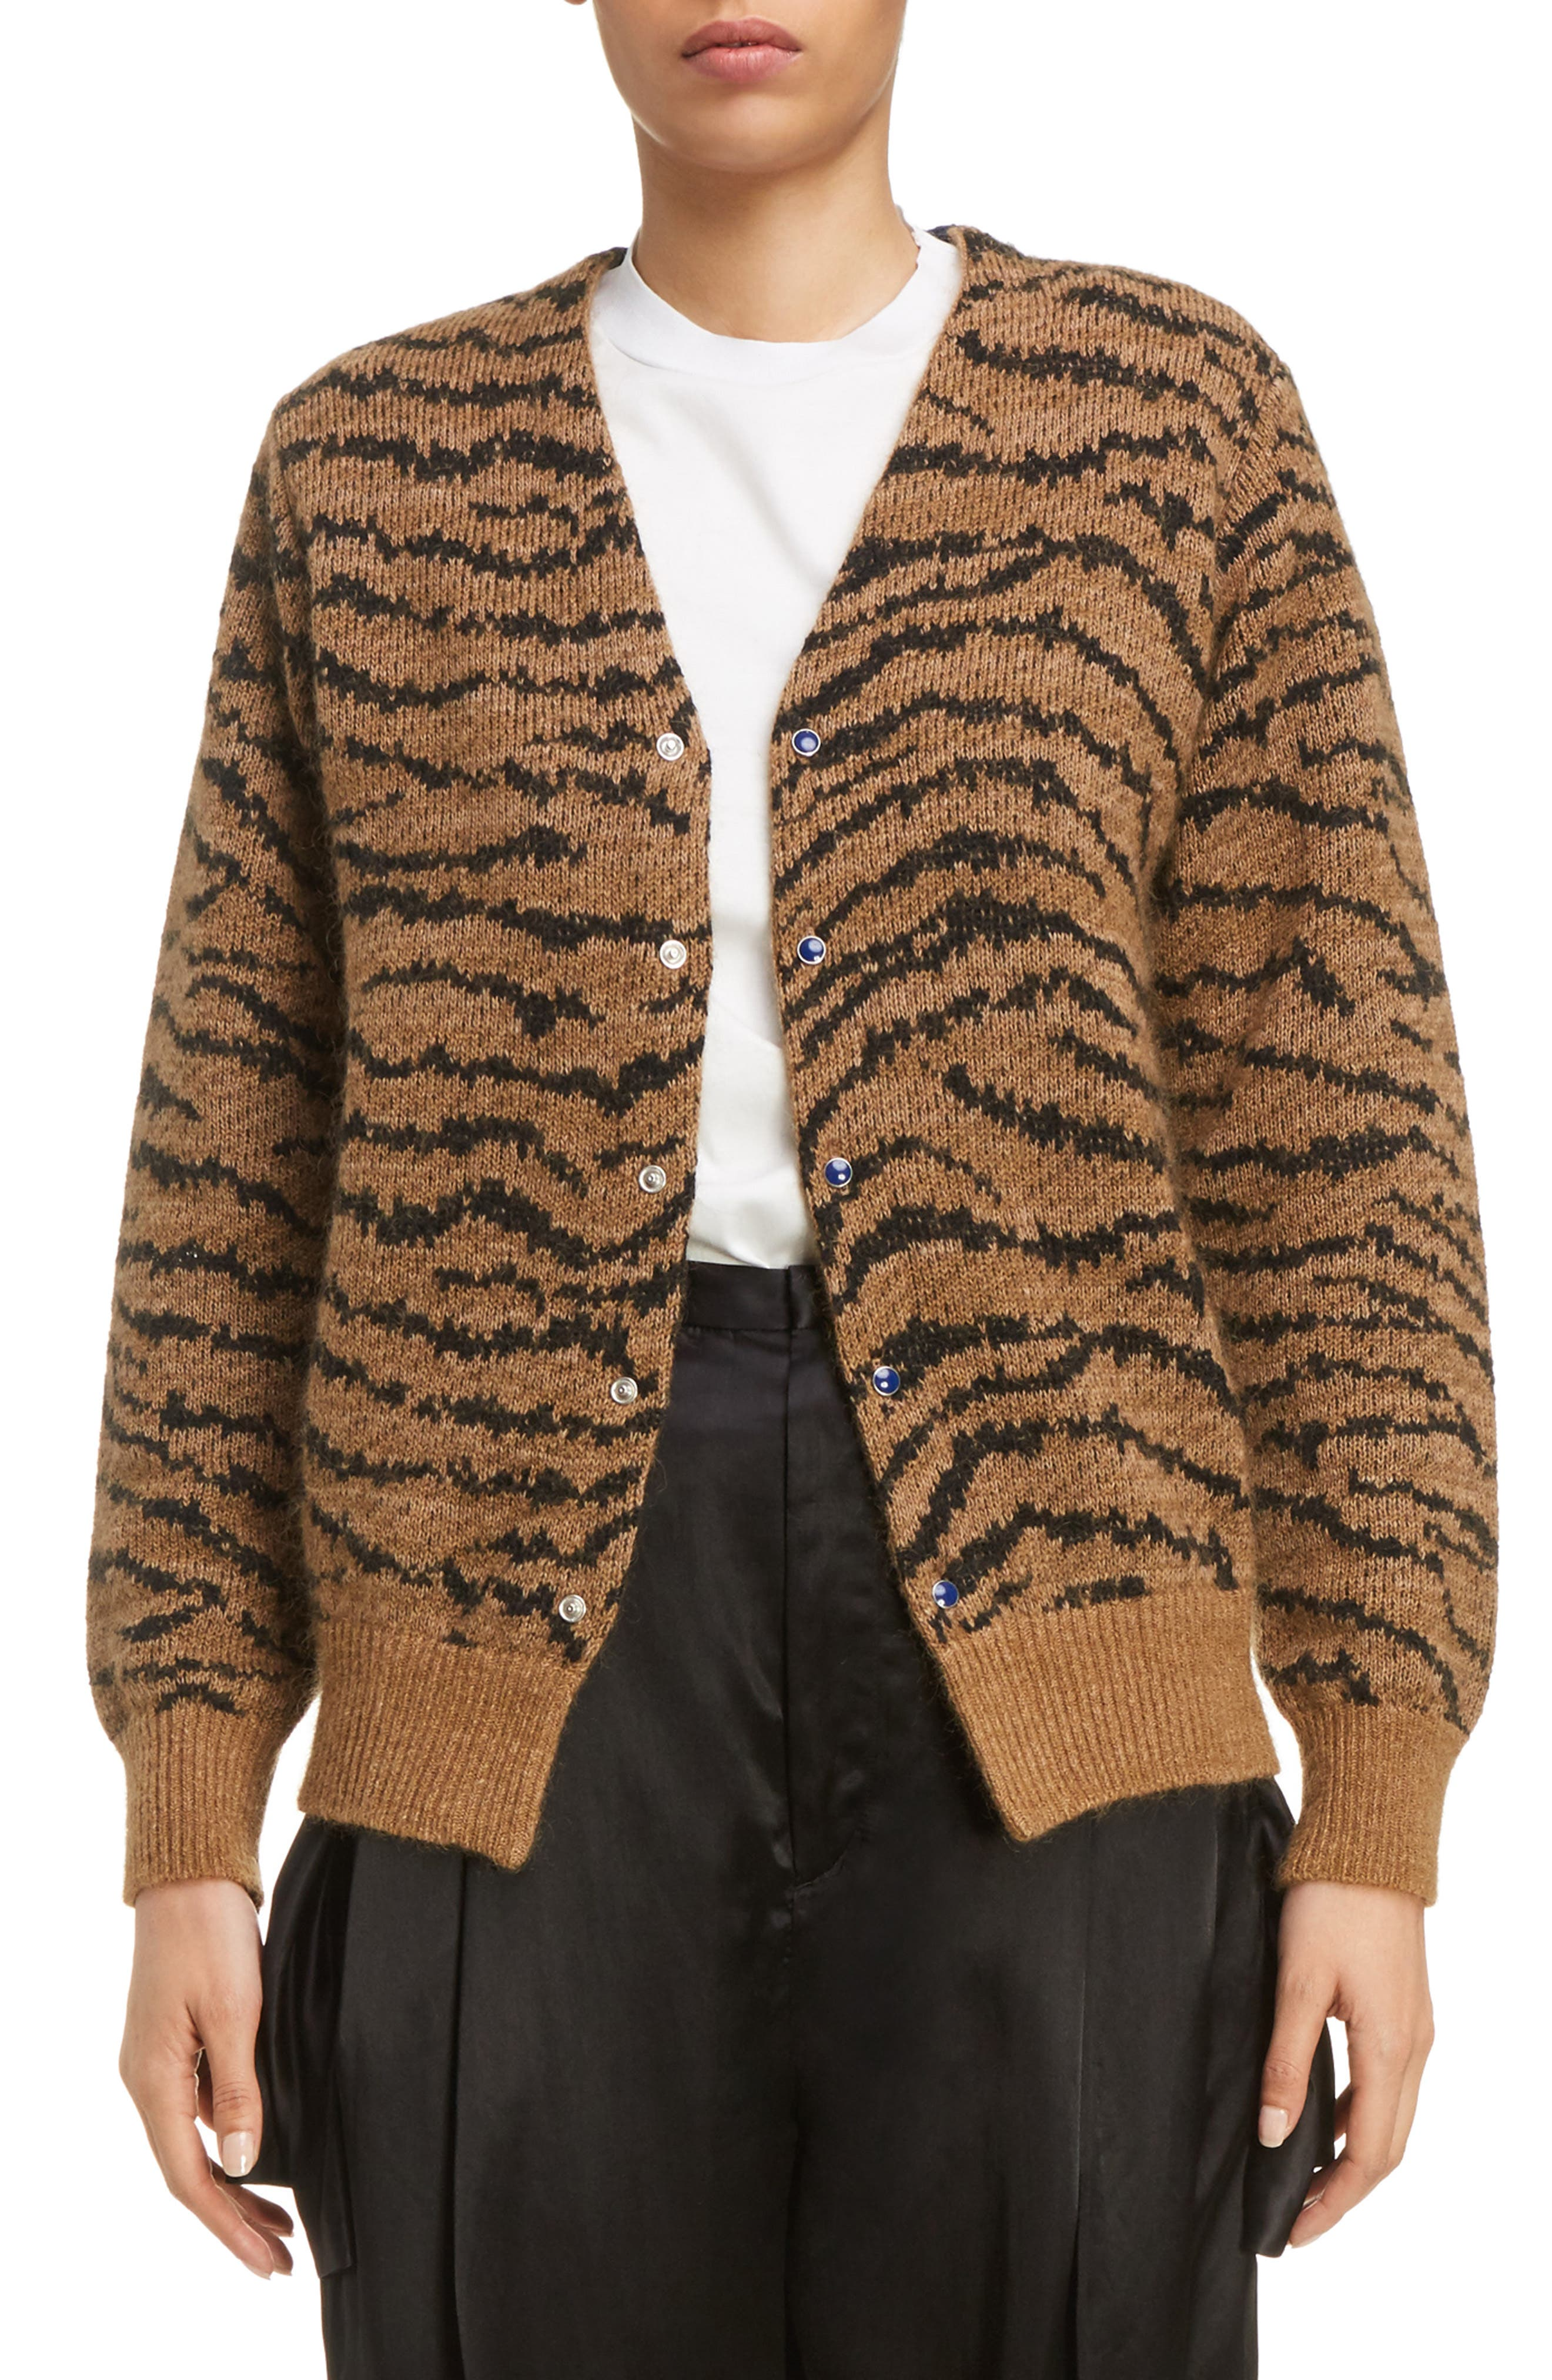 Tiger Jacquard Knit Button Cardigan,                         Main,                         color, Beige